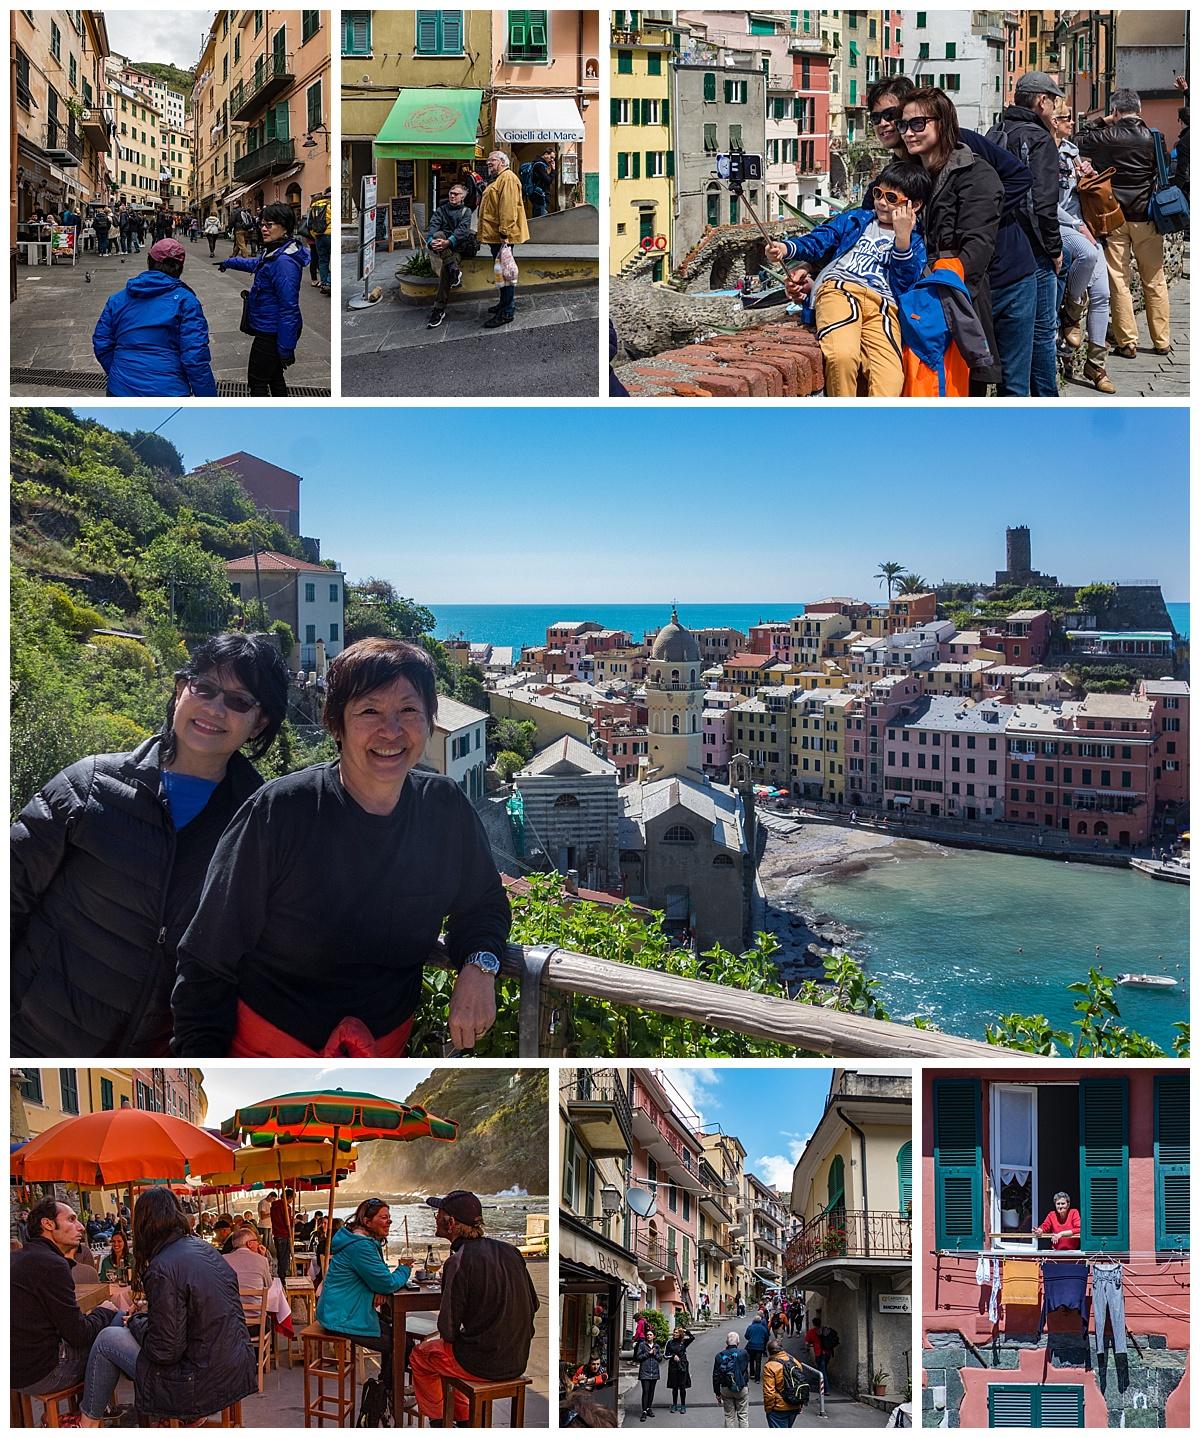 Cinque Terre, Italy - around town